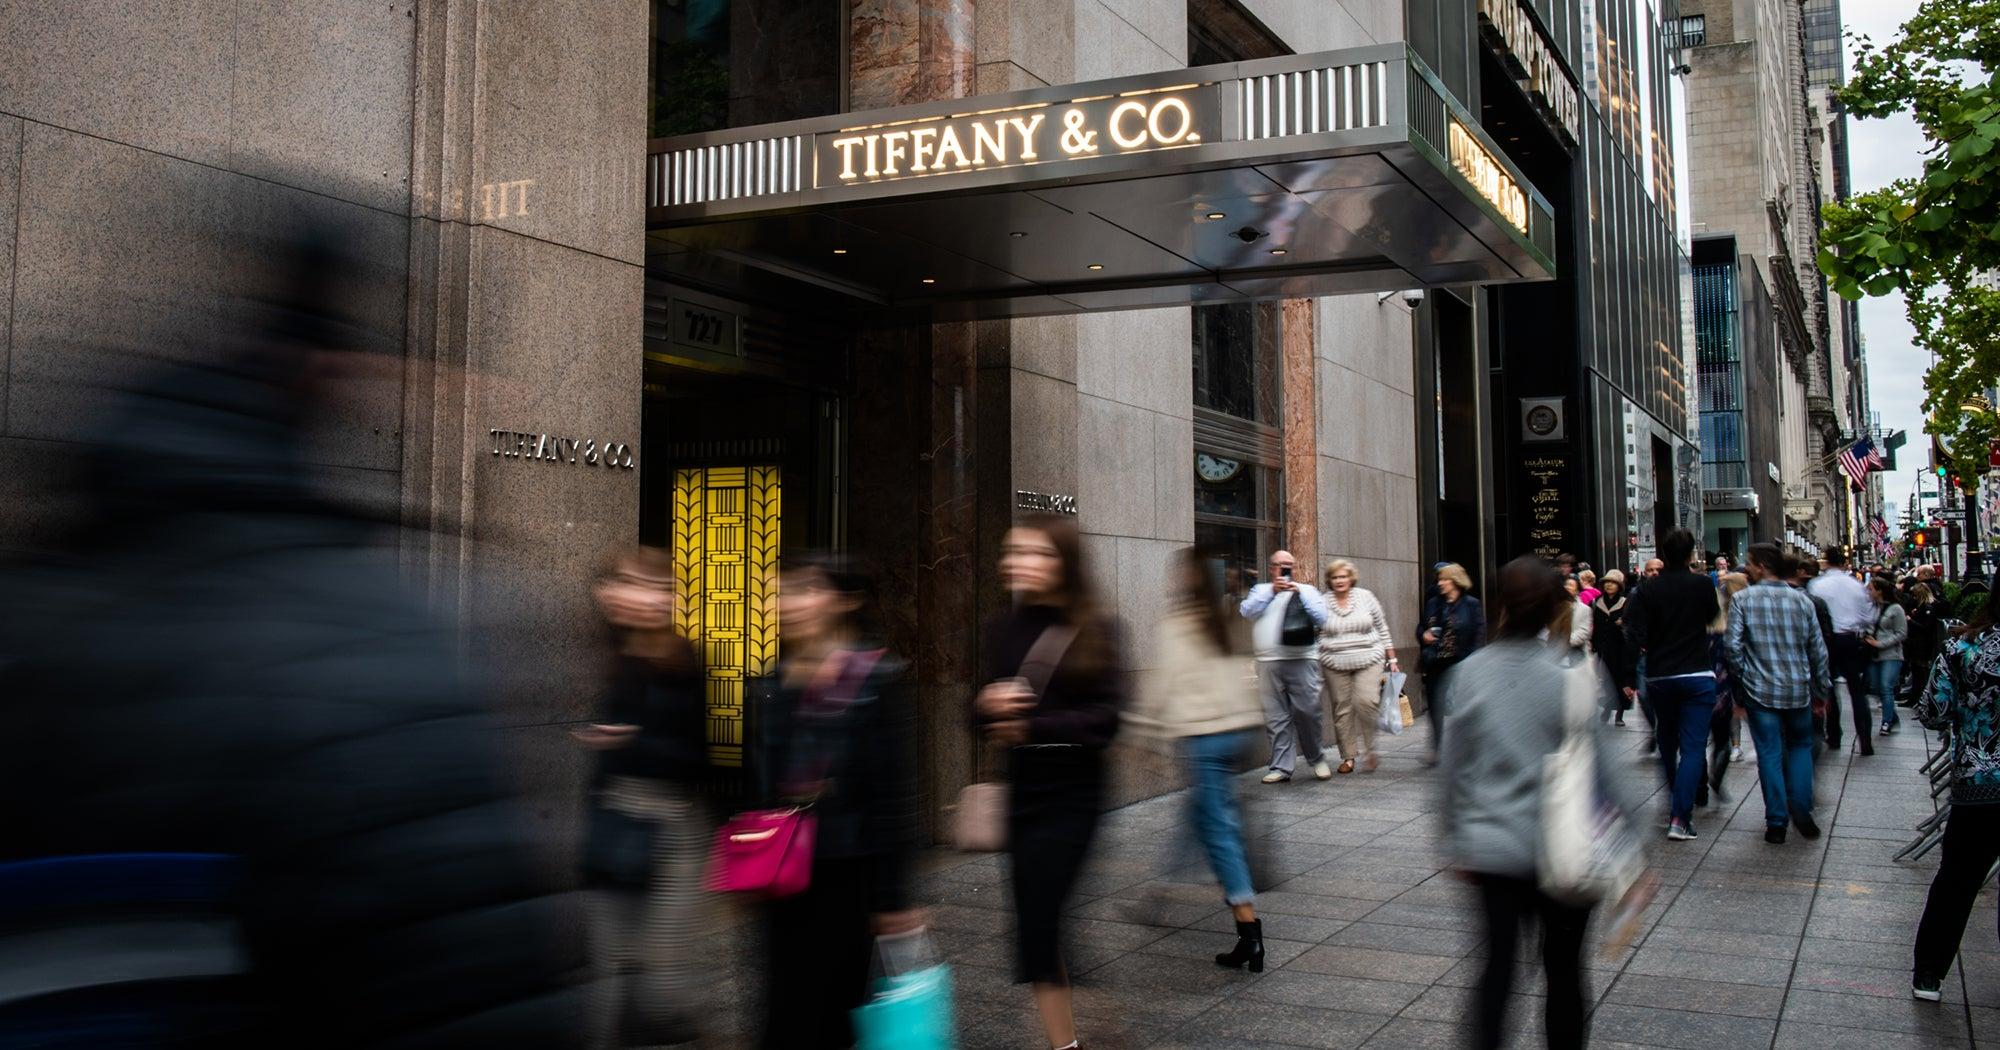 LVMH Acquires Tiffany & Co. For $16.2 Billion